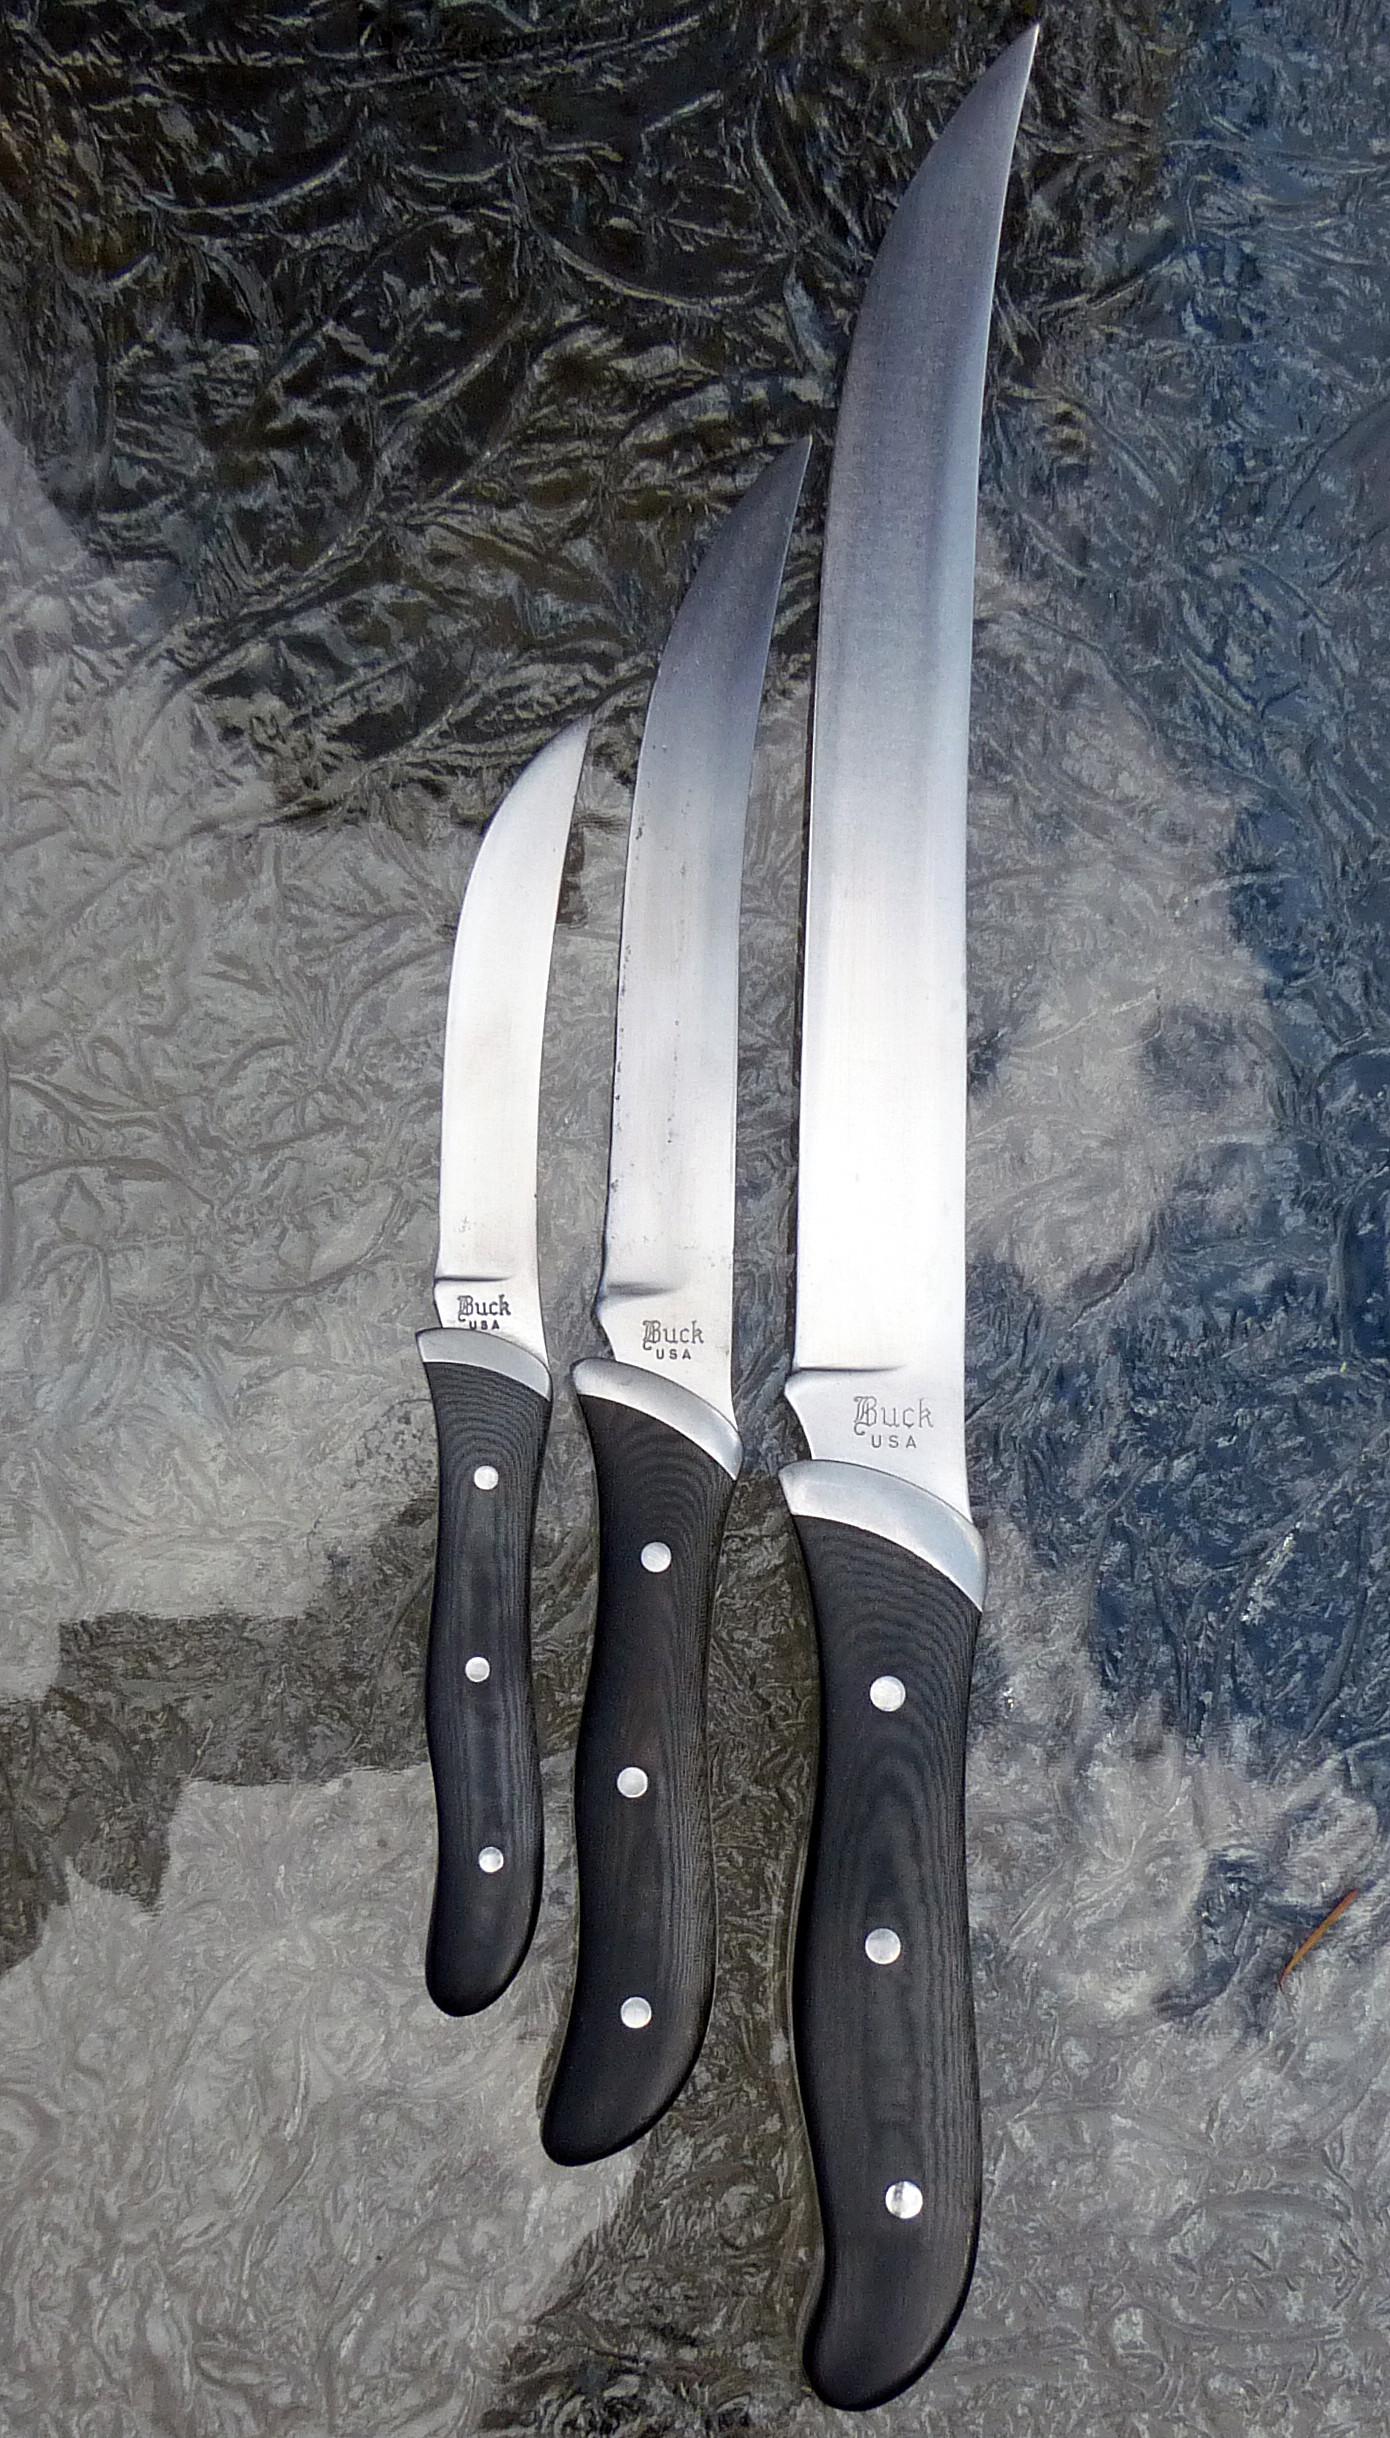 Buck Kitchen Knives Emperor S Bladeforums Com